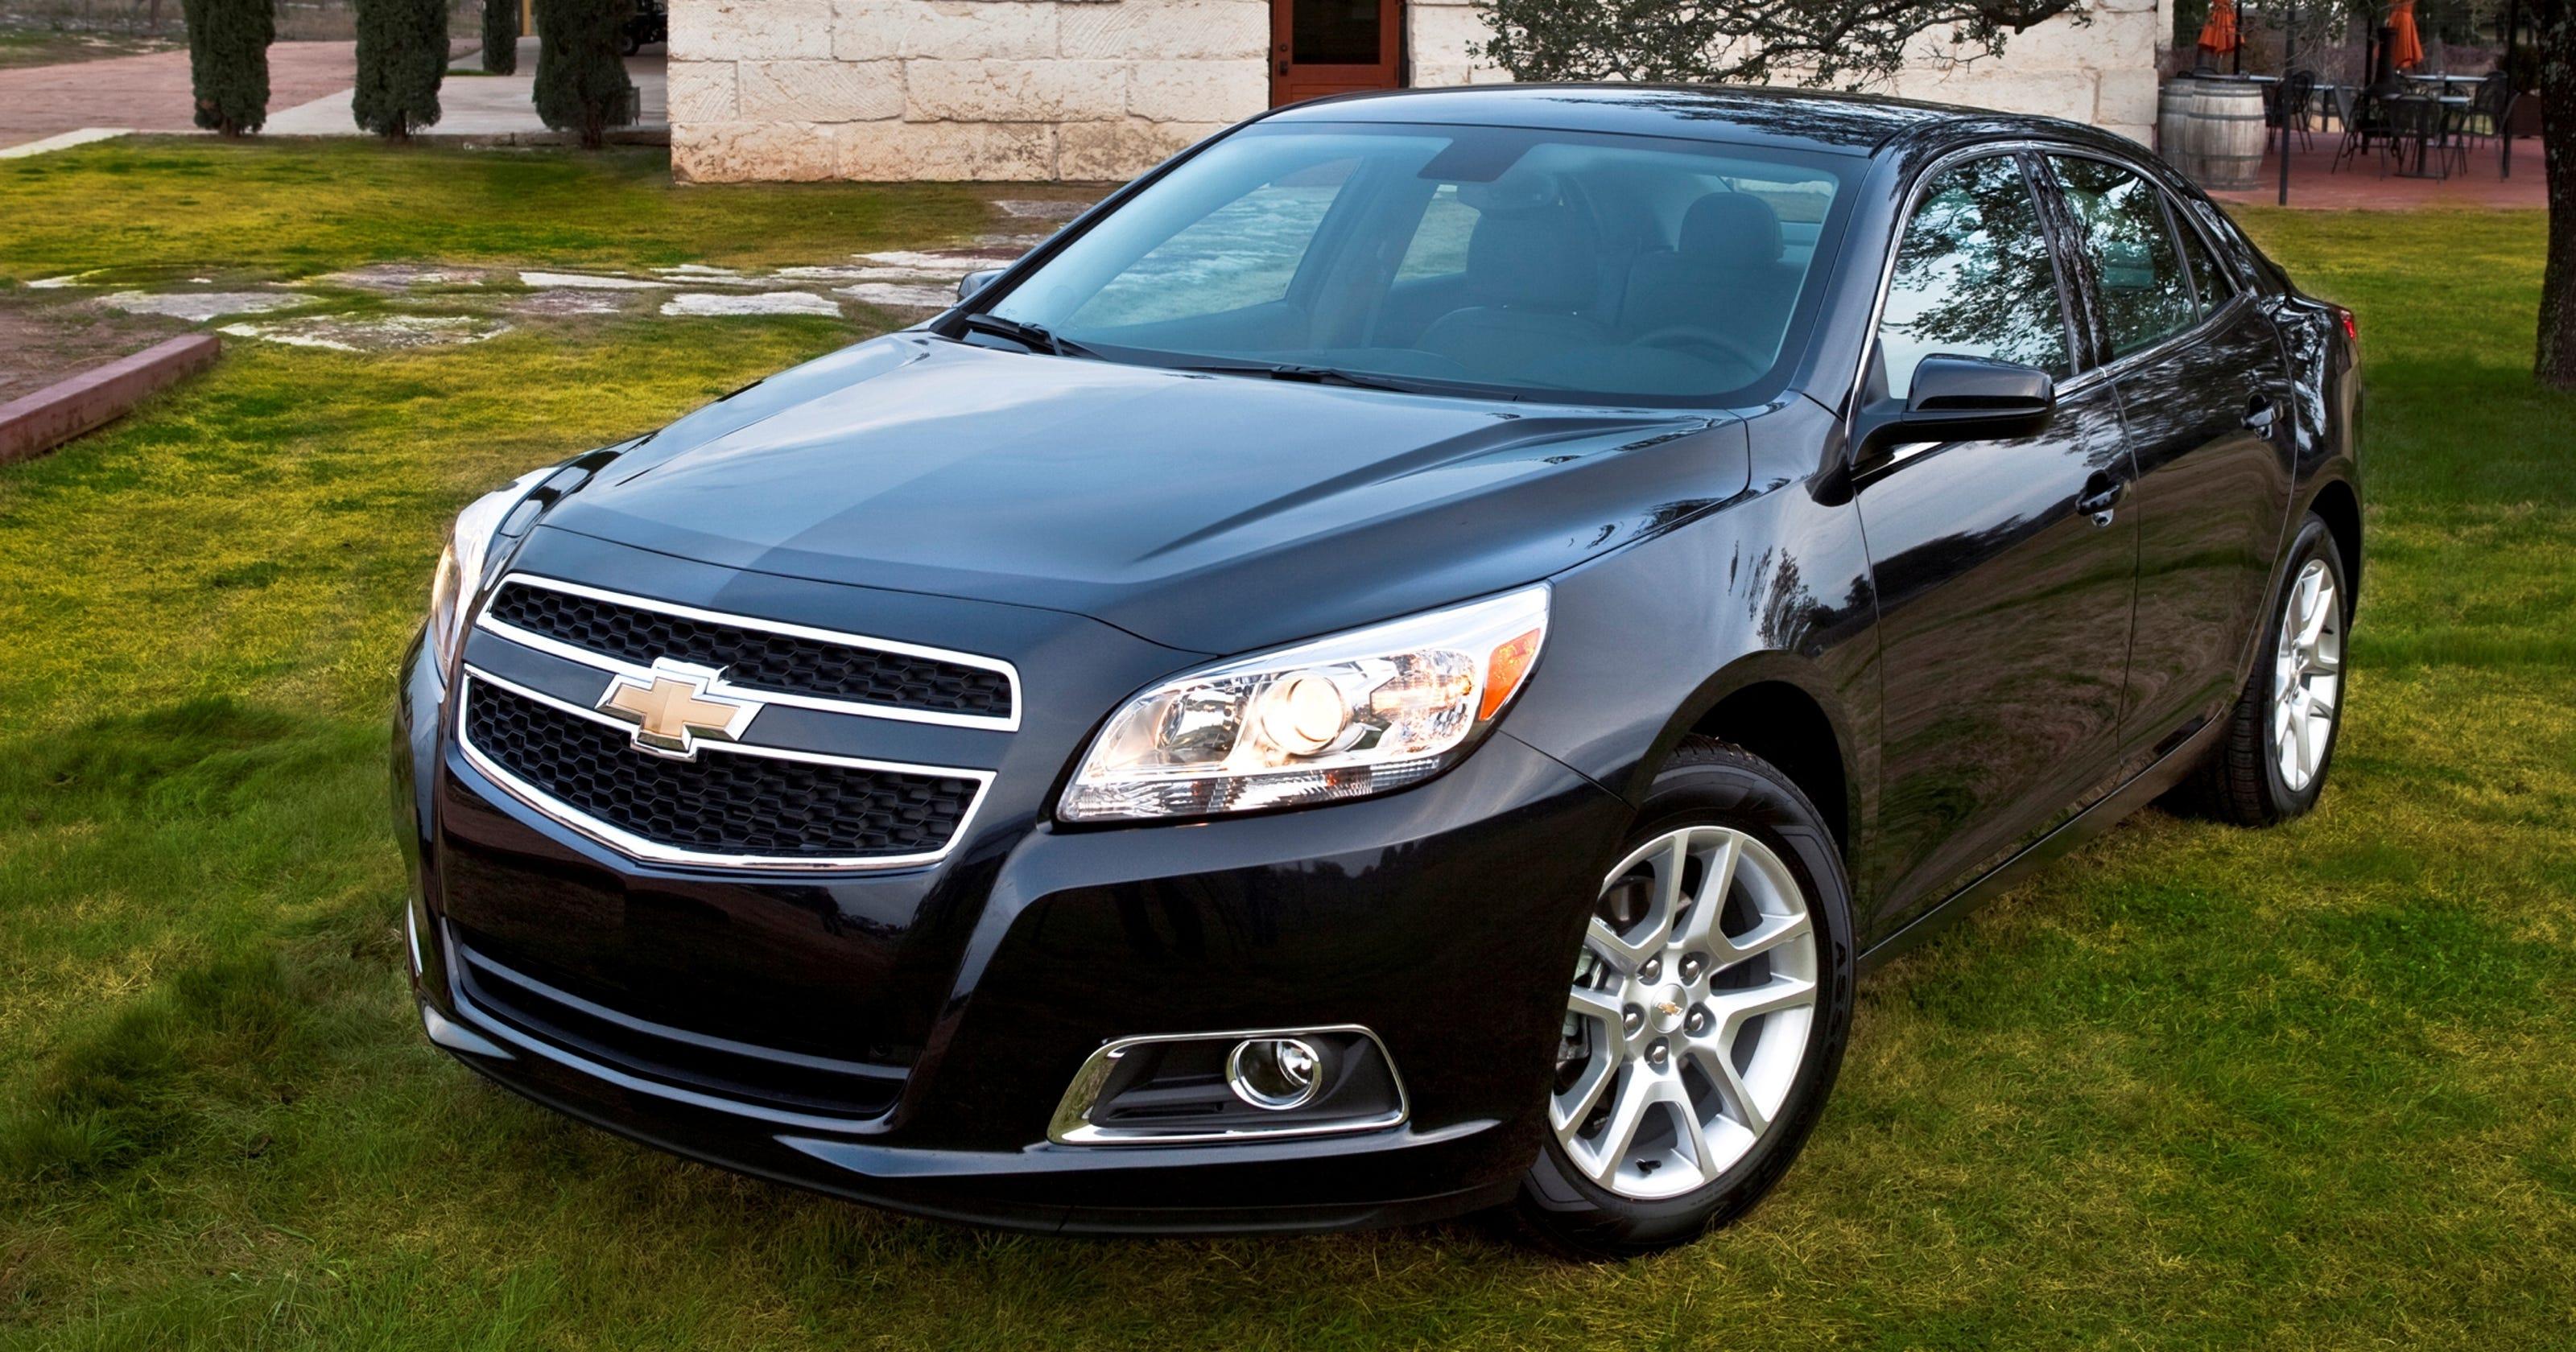 GM recalls eAssist mild hybrids for battery fire risk